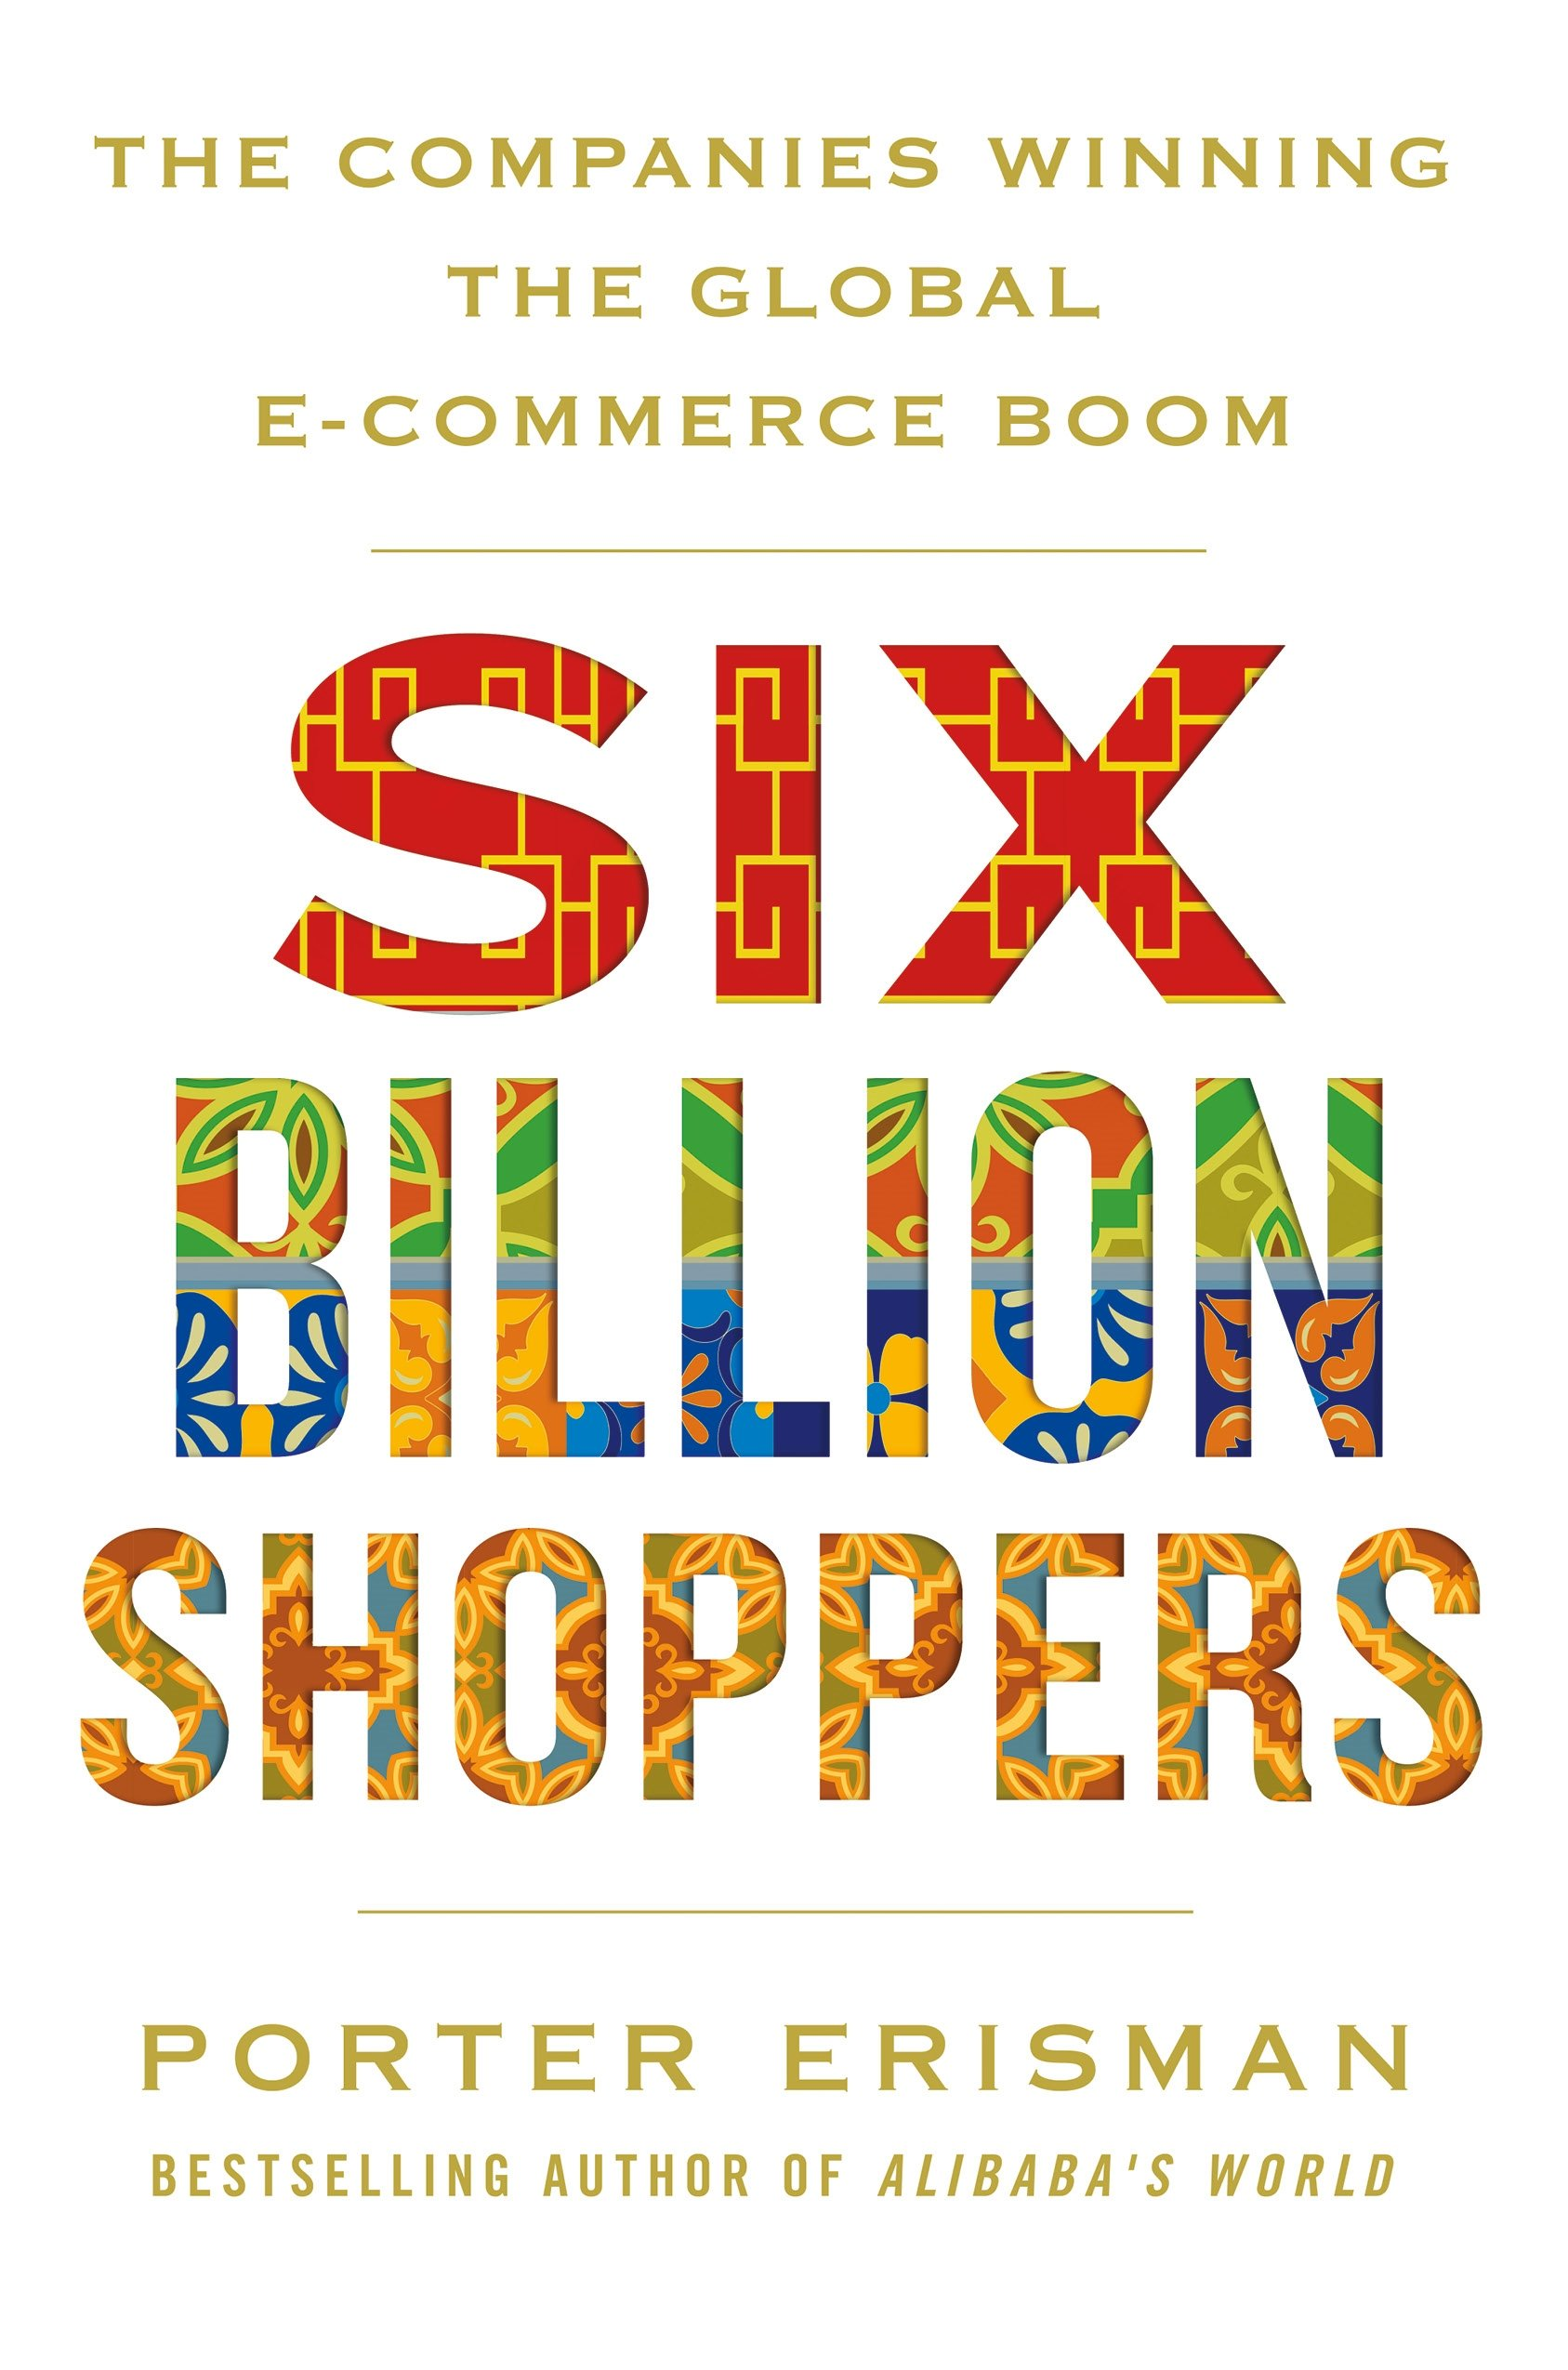 Read Online Six Billion Shoppers: The Companies Winning the Global E-Commerce Boom ebook